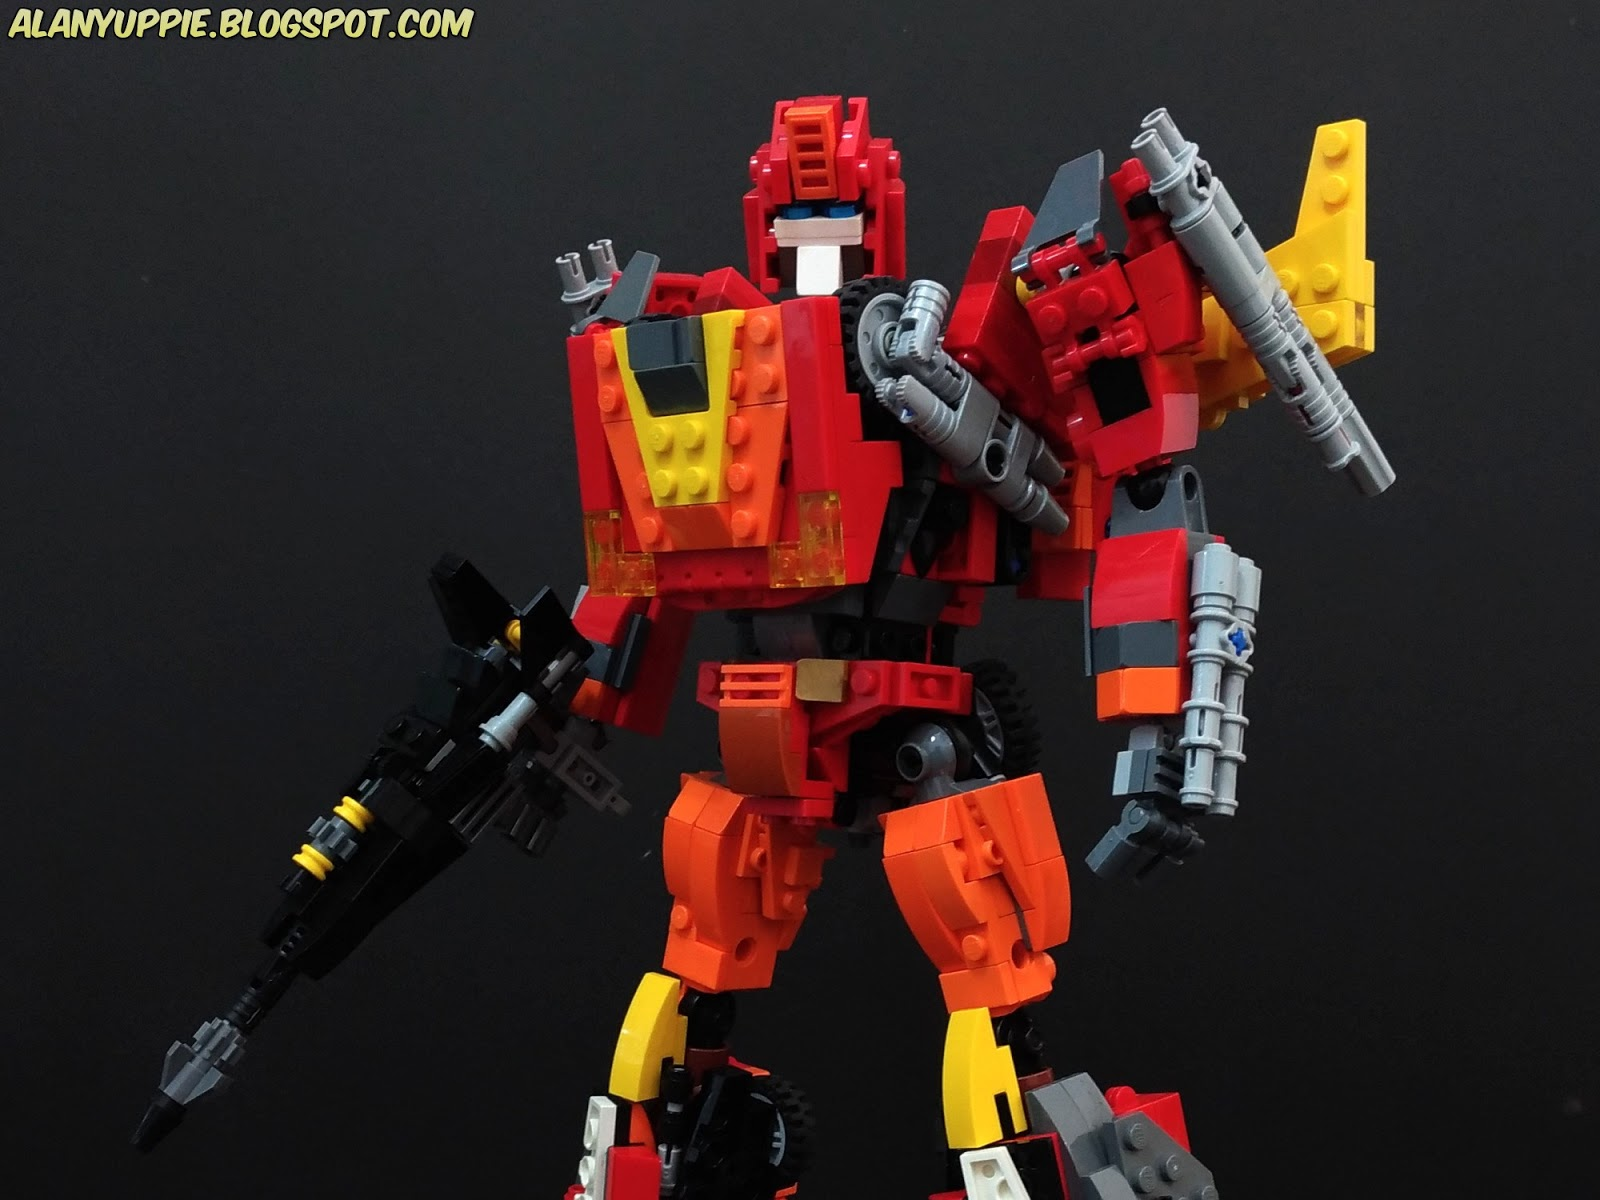 Alanyuppies LEGO Transformers LEGO Rodimus Prime Part 3